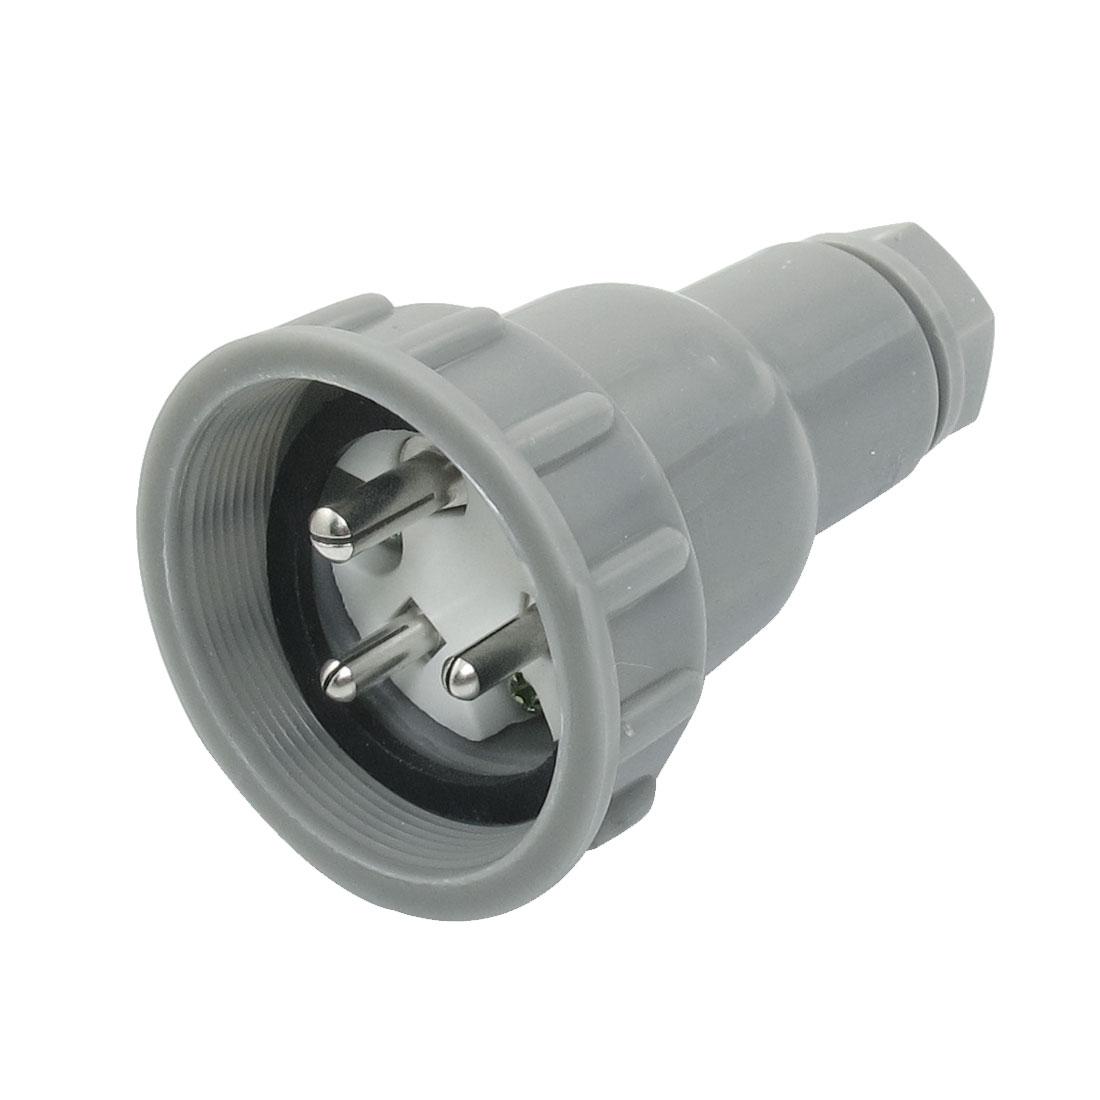 CTF3-1 Outdoor Water Resistant Marine Plug Gray 3P 500VAC 10A